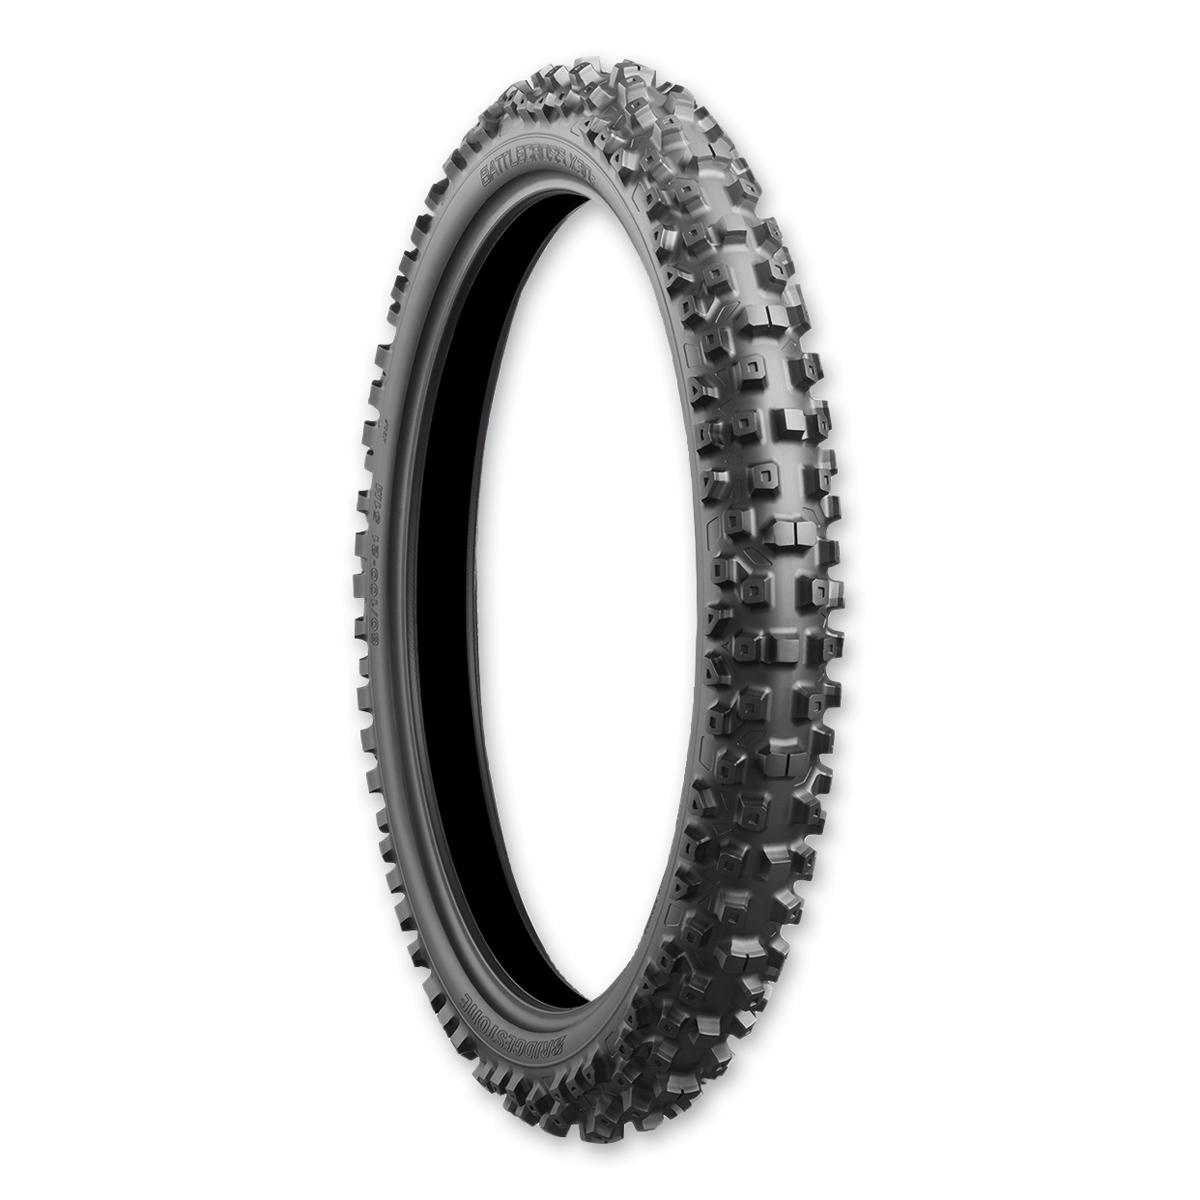 Bridgestone Battlecross X30 80/100-21 I/T Front Tire